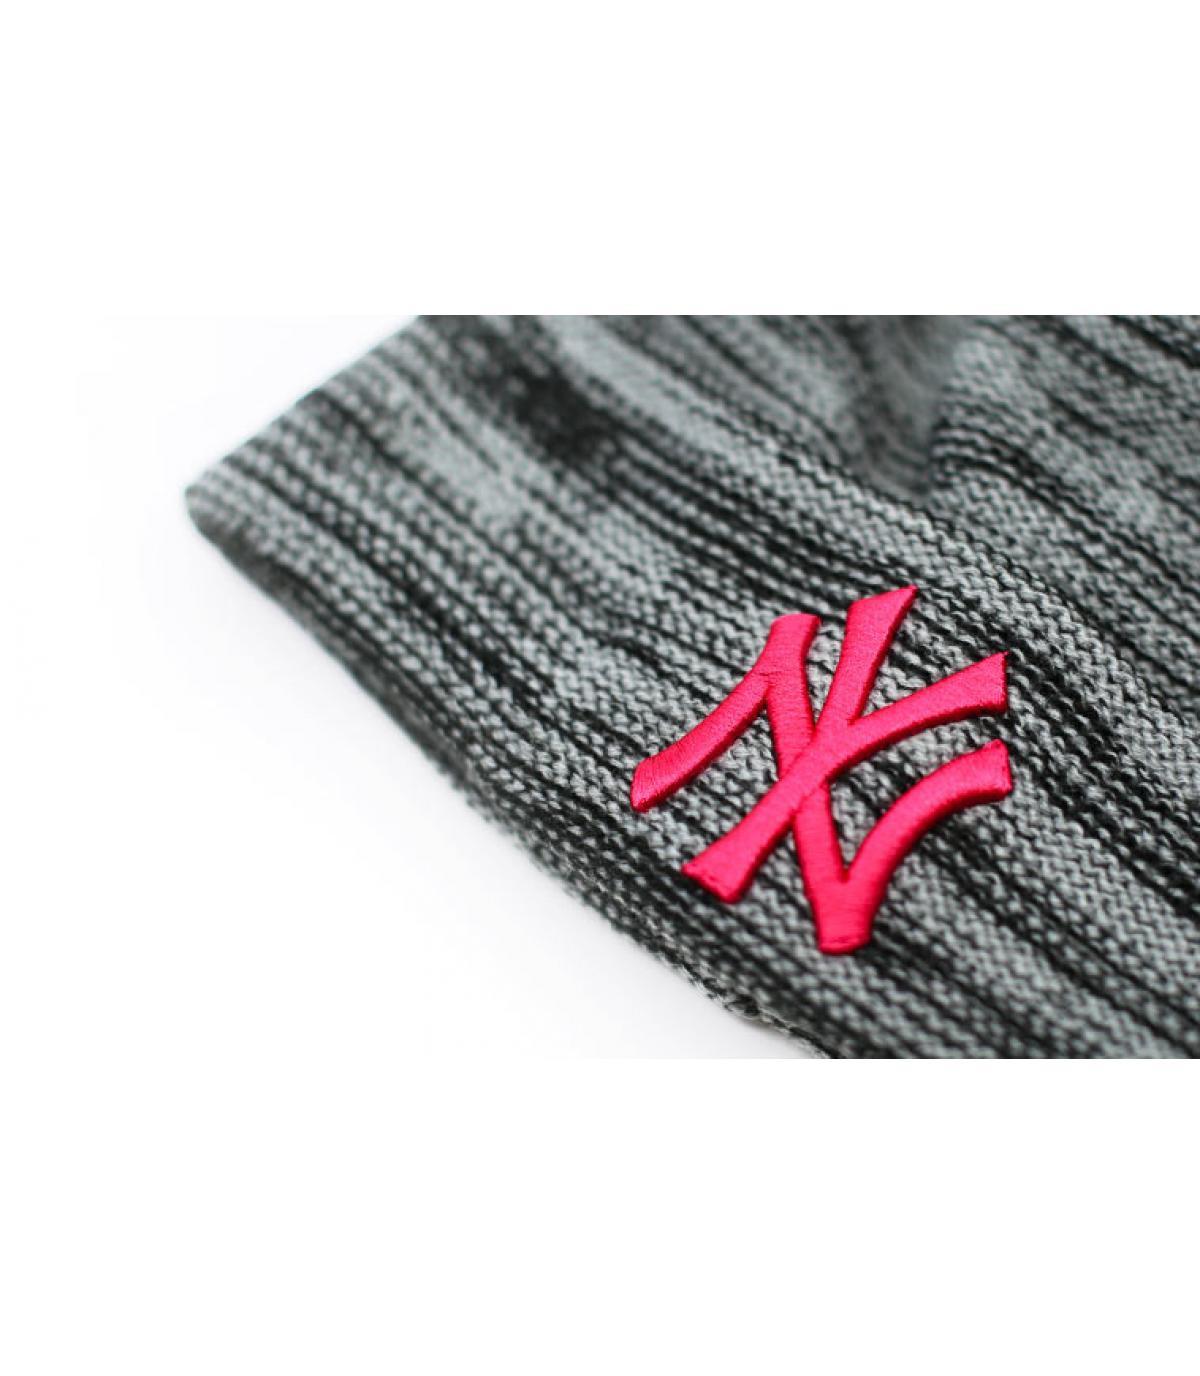 Details Mütze Wmns NY Marl Knit gray beetroot - Abbildung 3